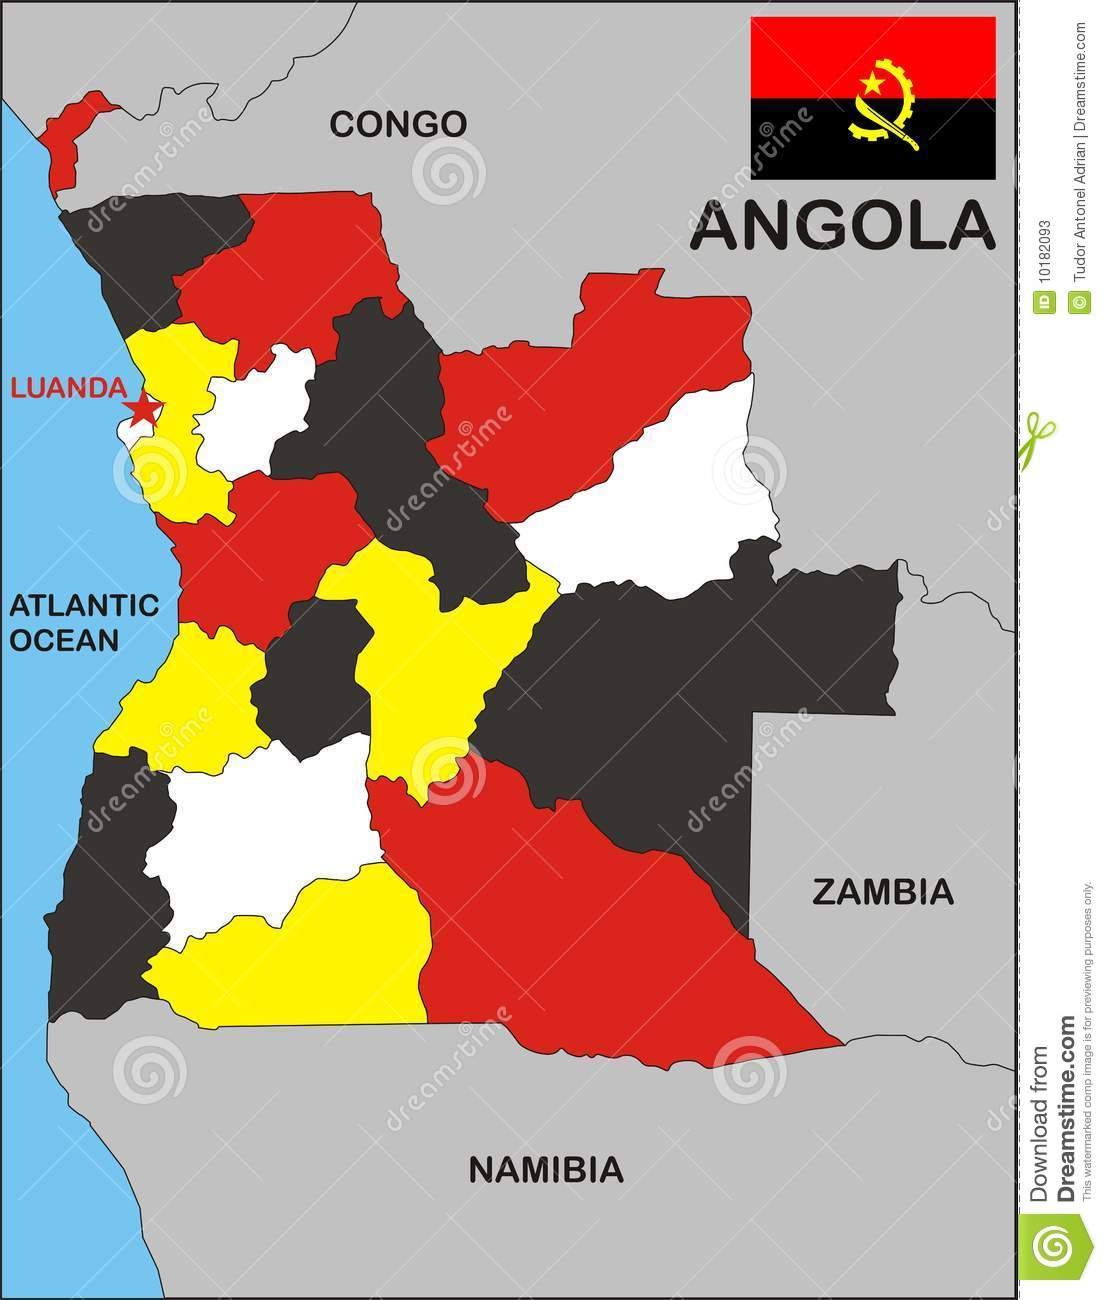 Symbolic Sentence For Rafael Marques De Morais And Maka Angola